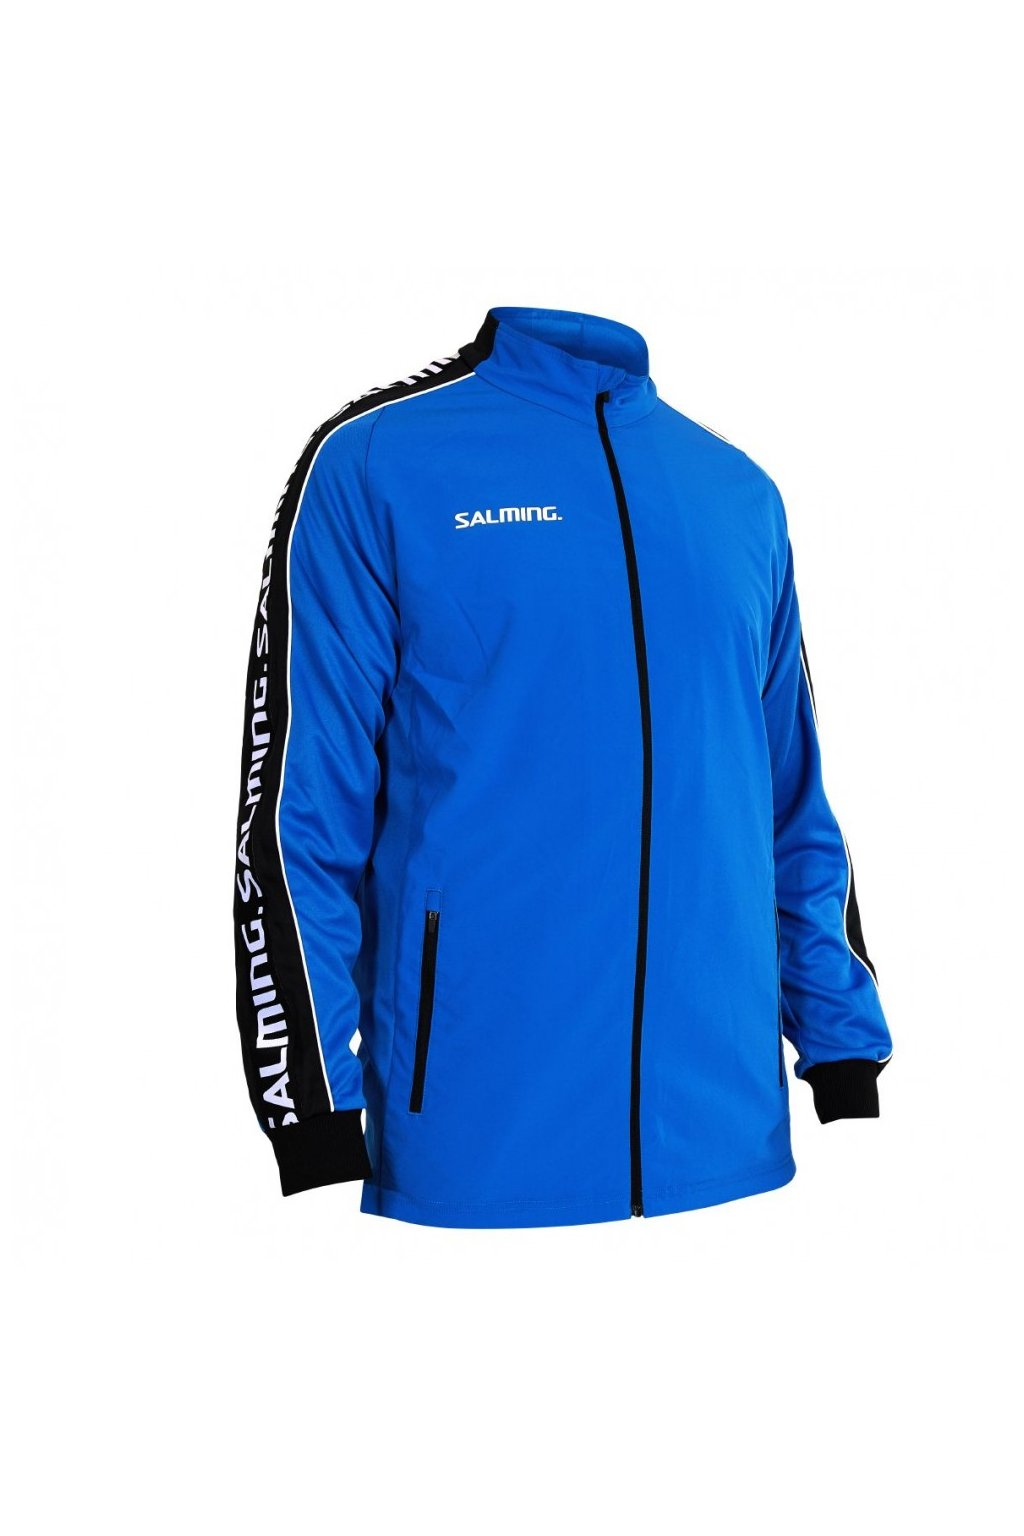 salming delta jacket men (3)